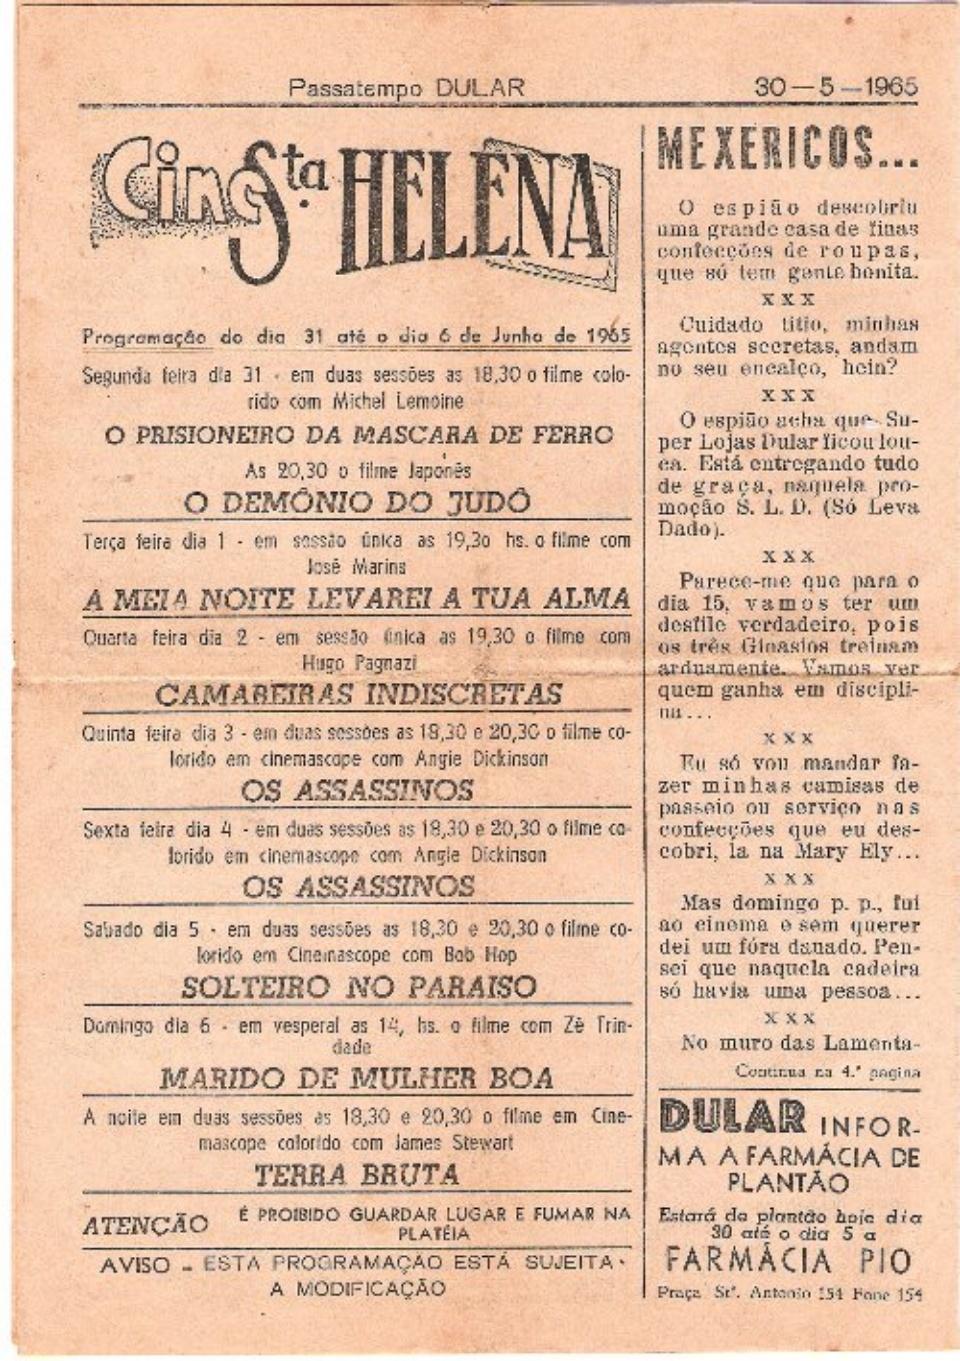 04. PASSATEMPO DULAR - 07.02 a 30.05.1965